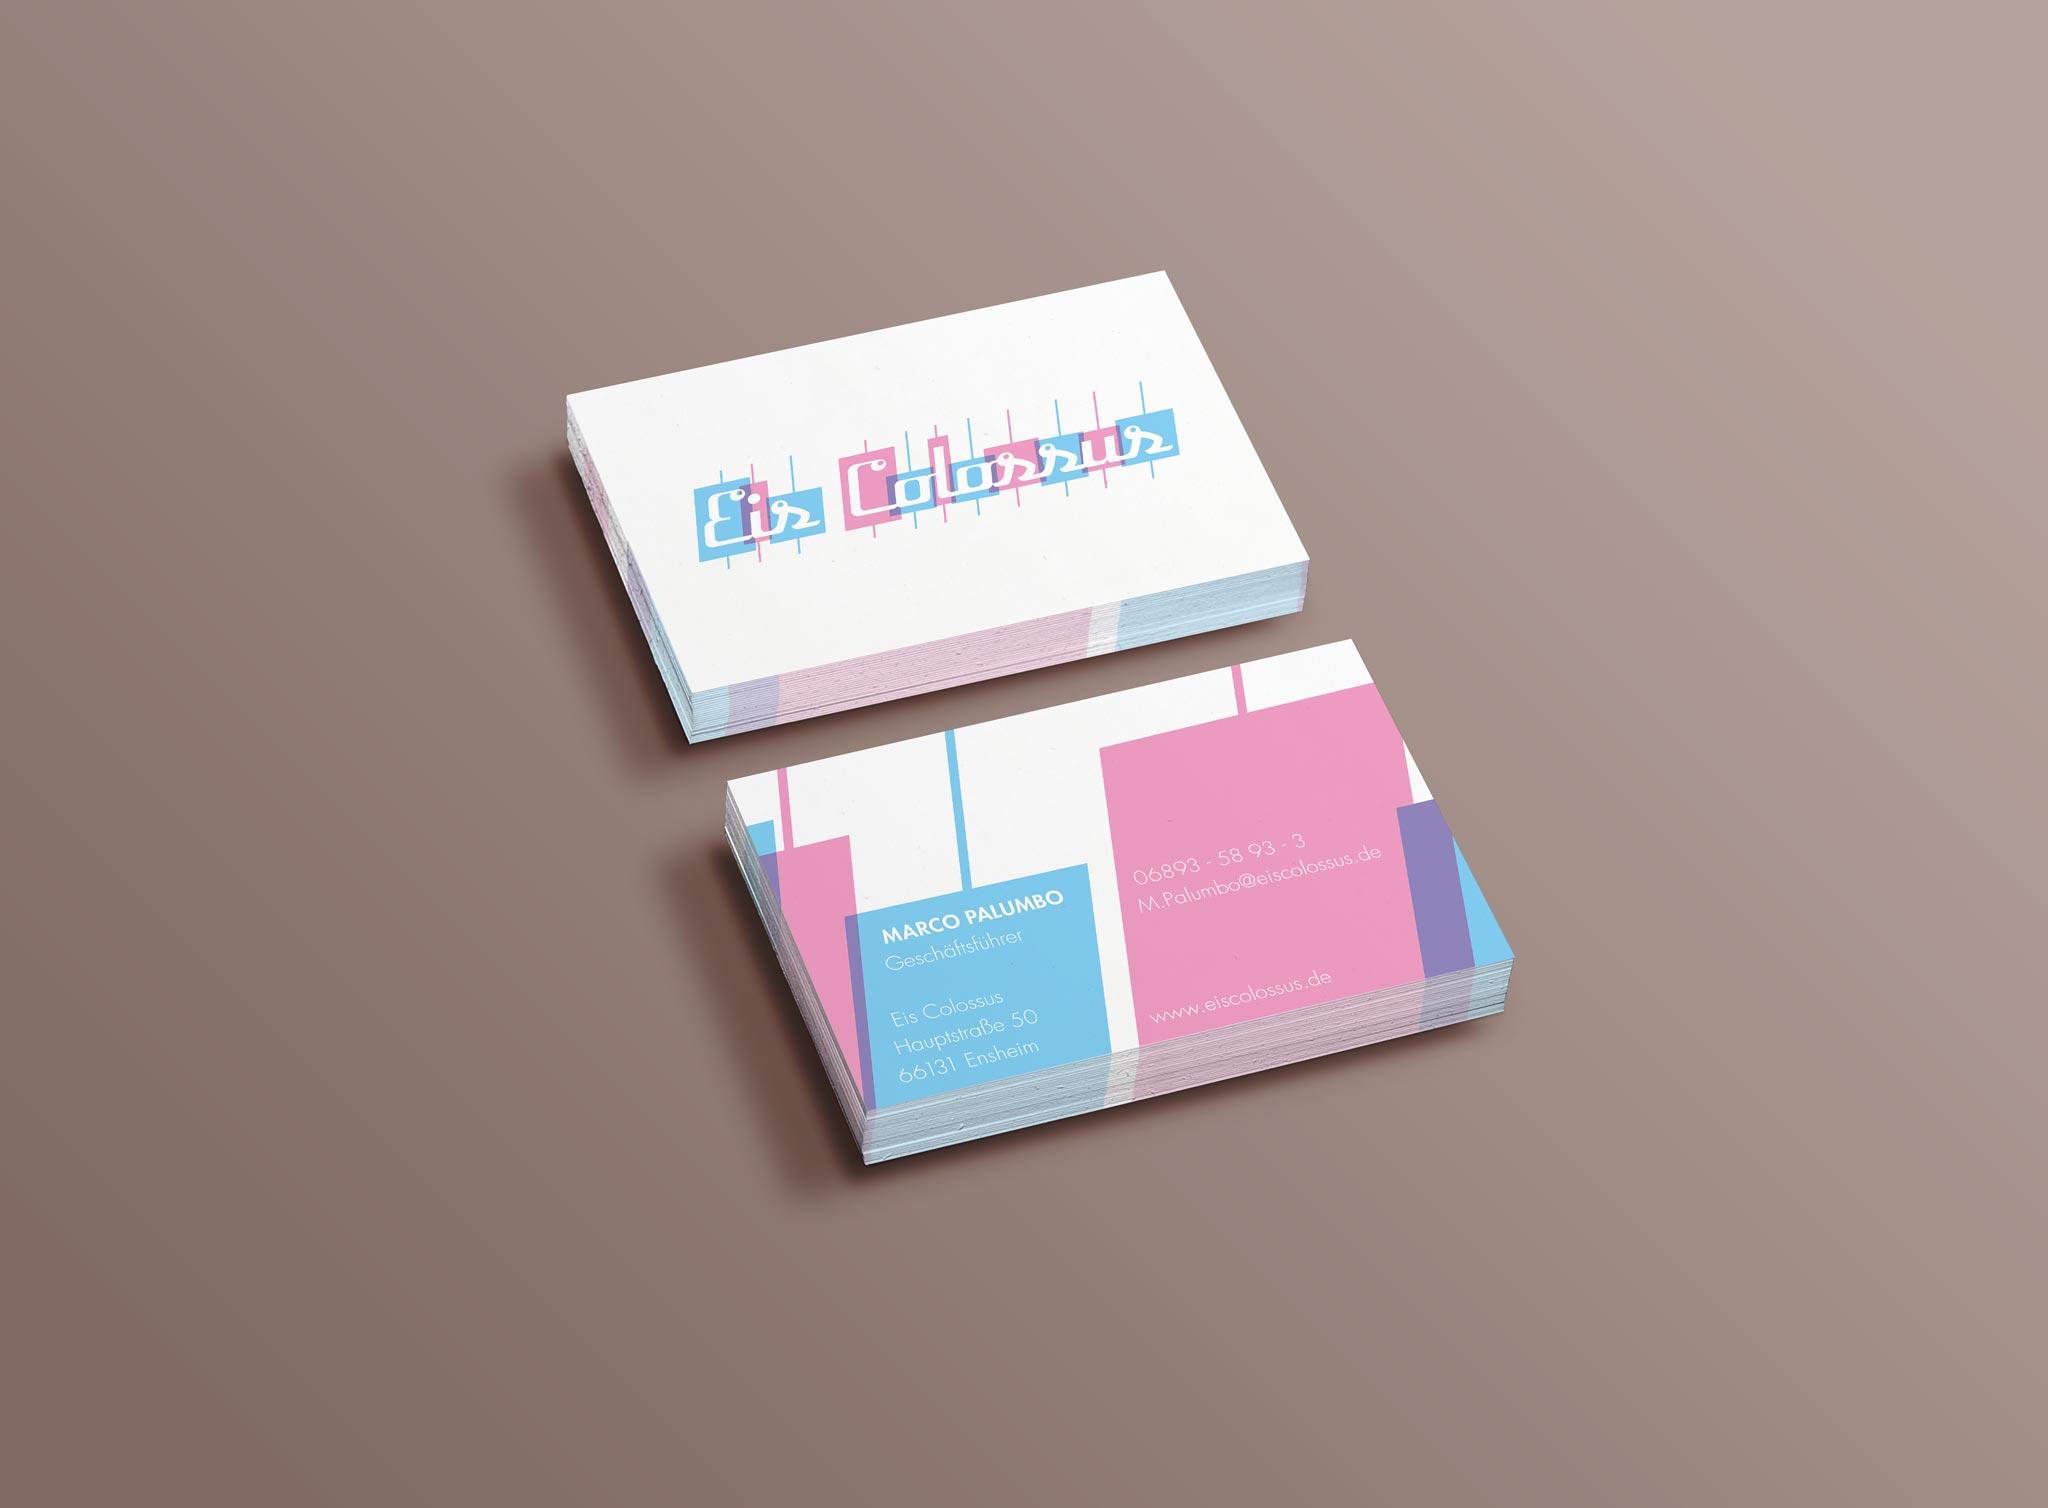 Eis Colossus Corporate Design Visitenkarte Gesa Siebert Kommunikationsdesign